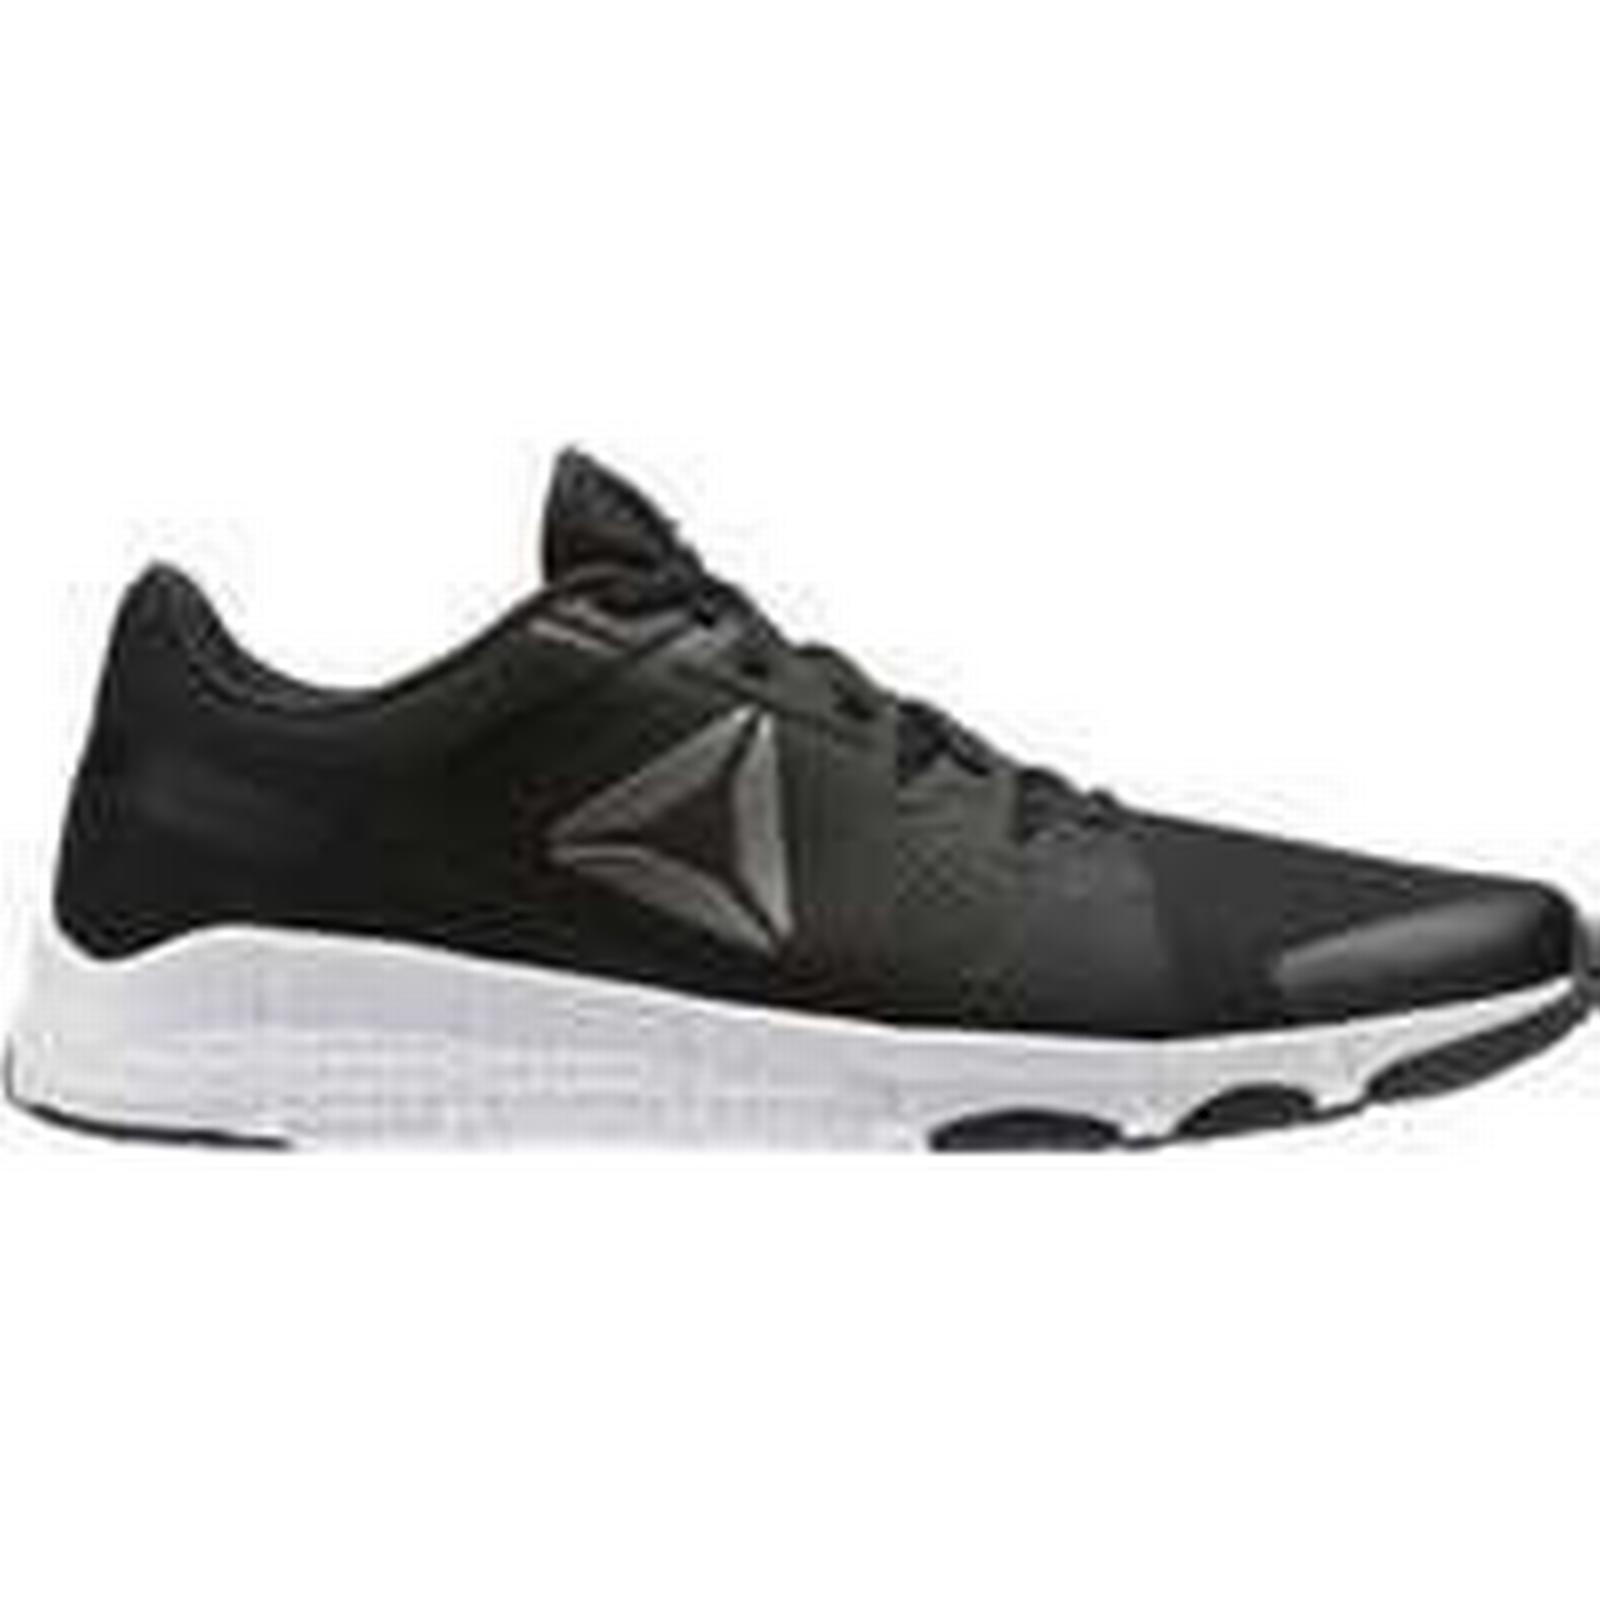 Spartoo.co.uk Shoes Reebok Sport Trainflex men's Shoes Spartoo.co.uk (Trainers) in Black e4c901